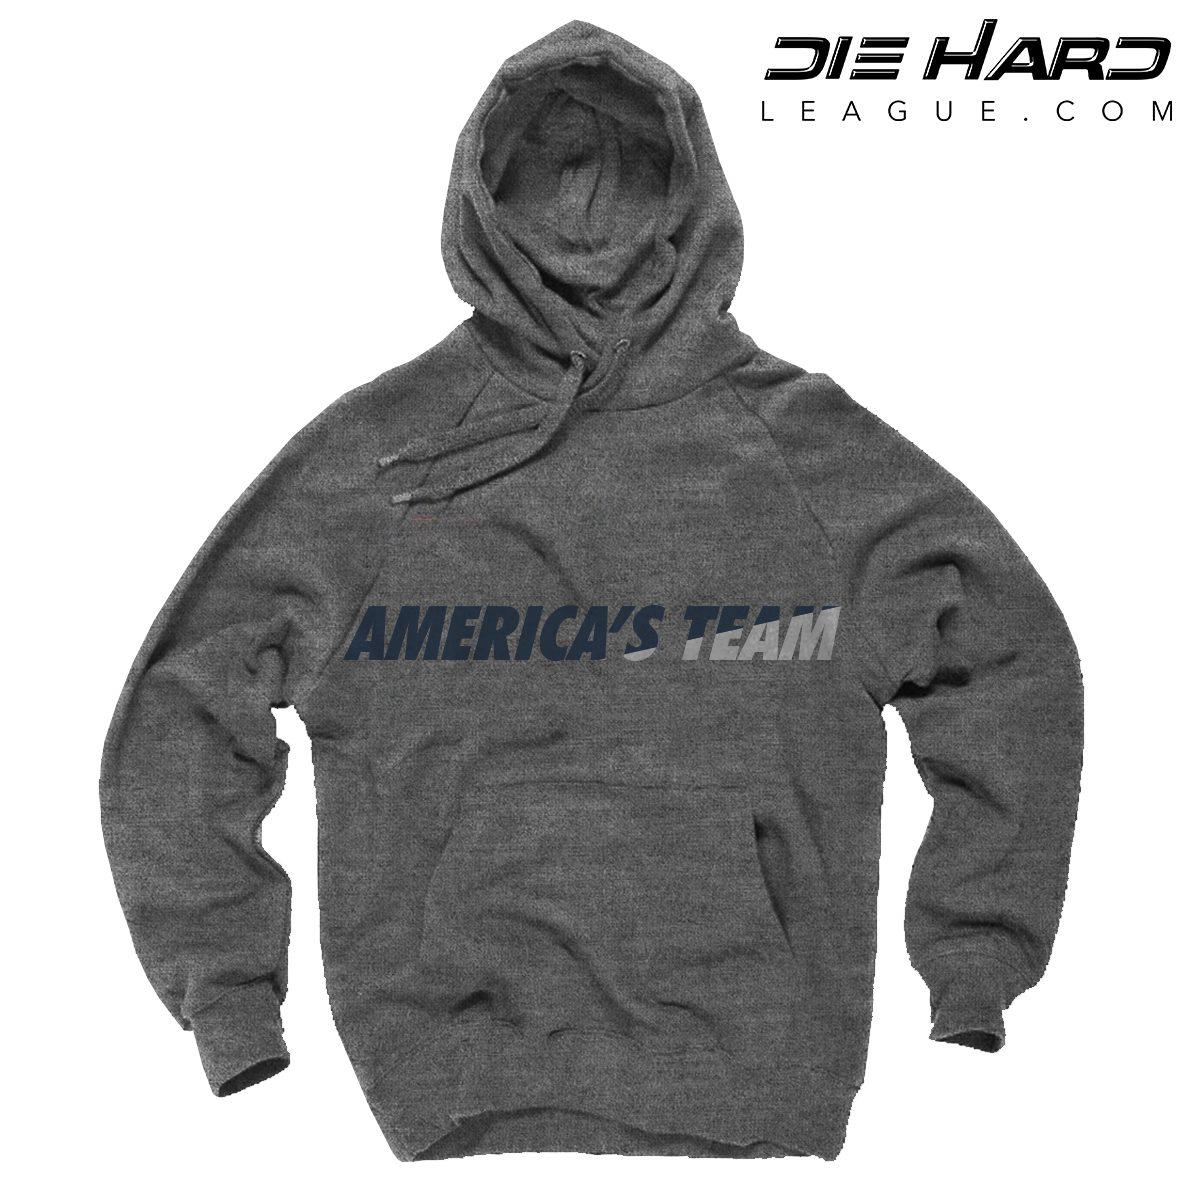 huge discount 7a388 9924e Cowboys Hoodie - Dallas Cowboys Americas Team Heather Gray Hoodie